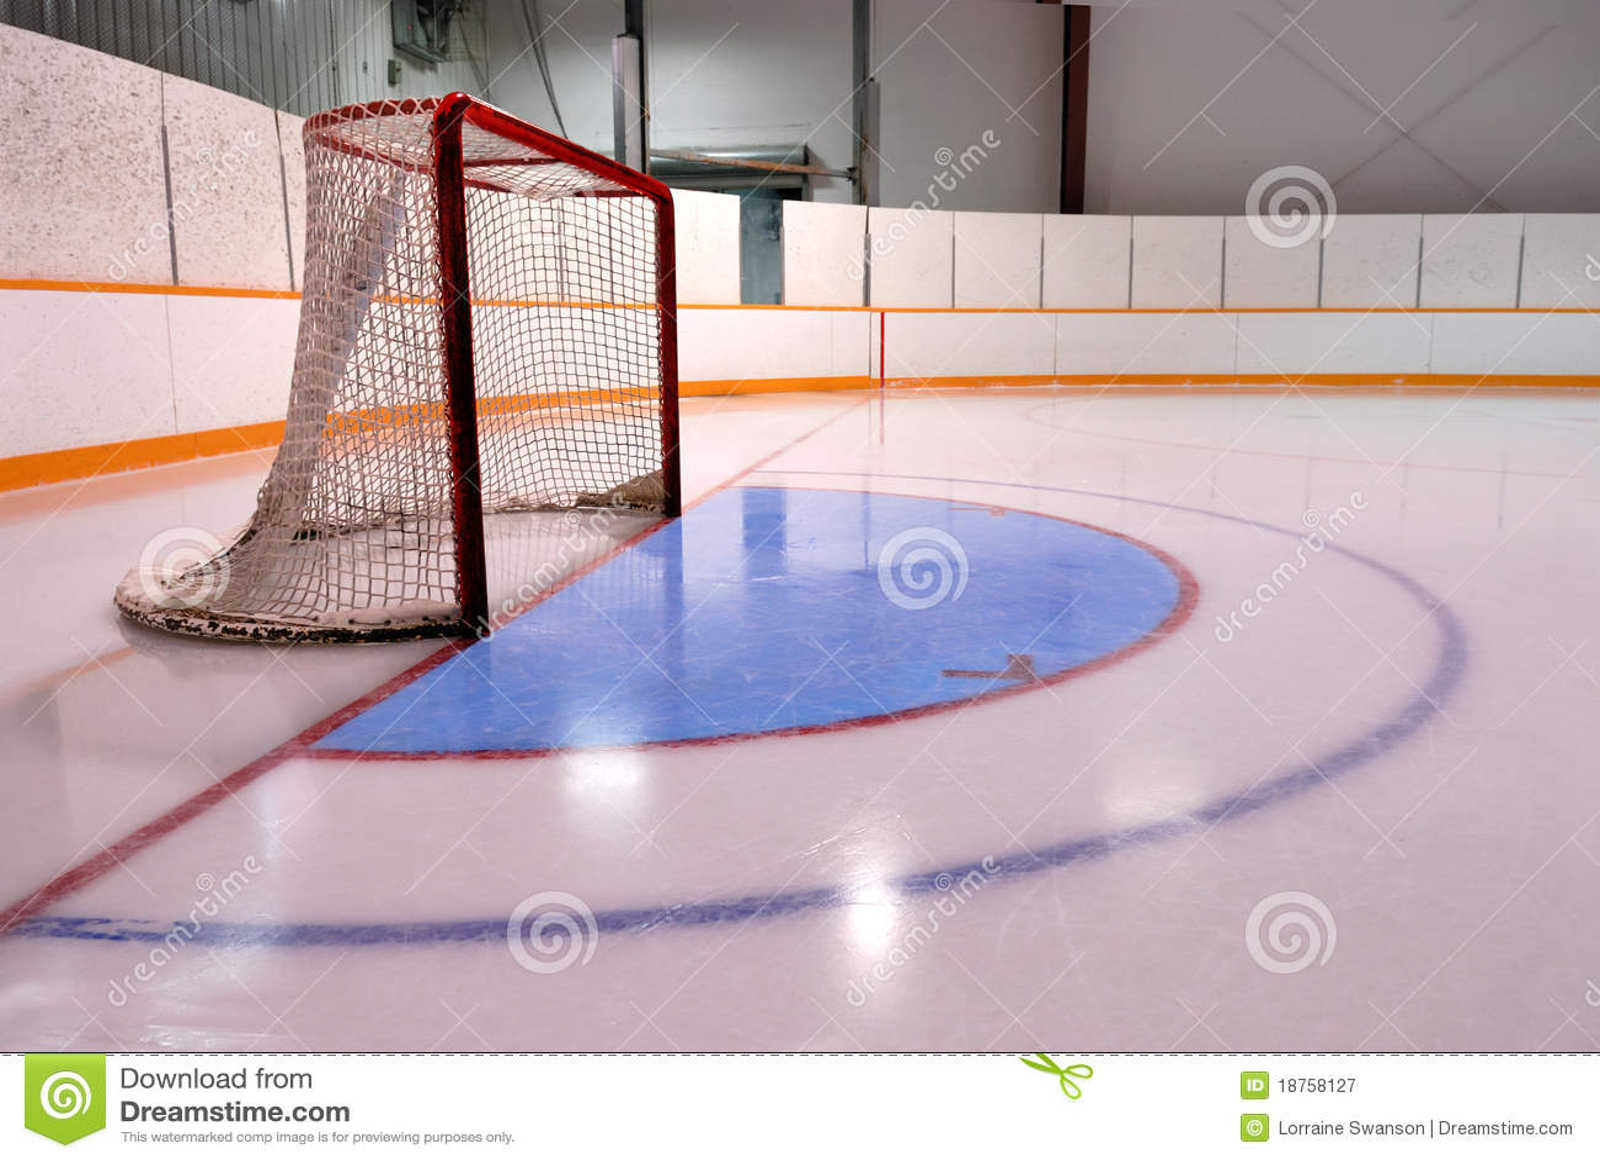 Hokeja netto ringette lodowisko